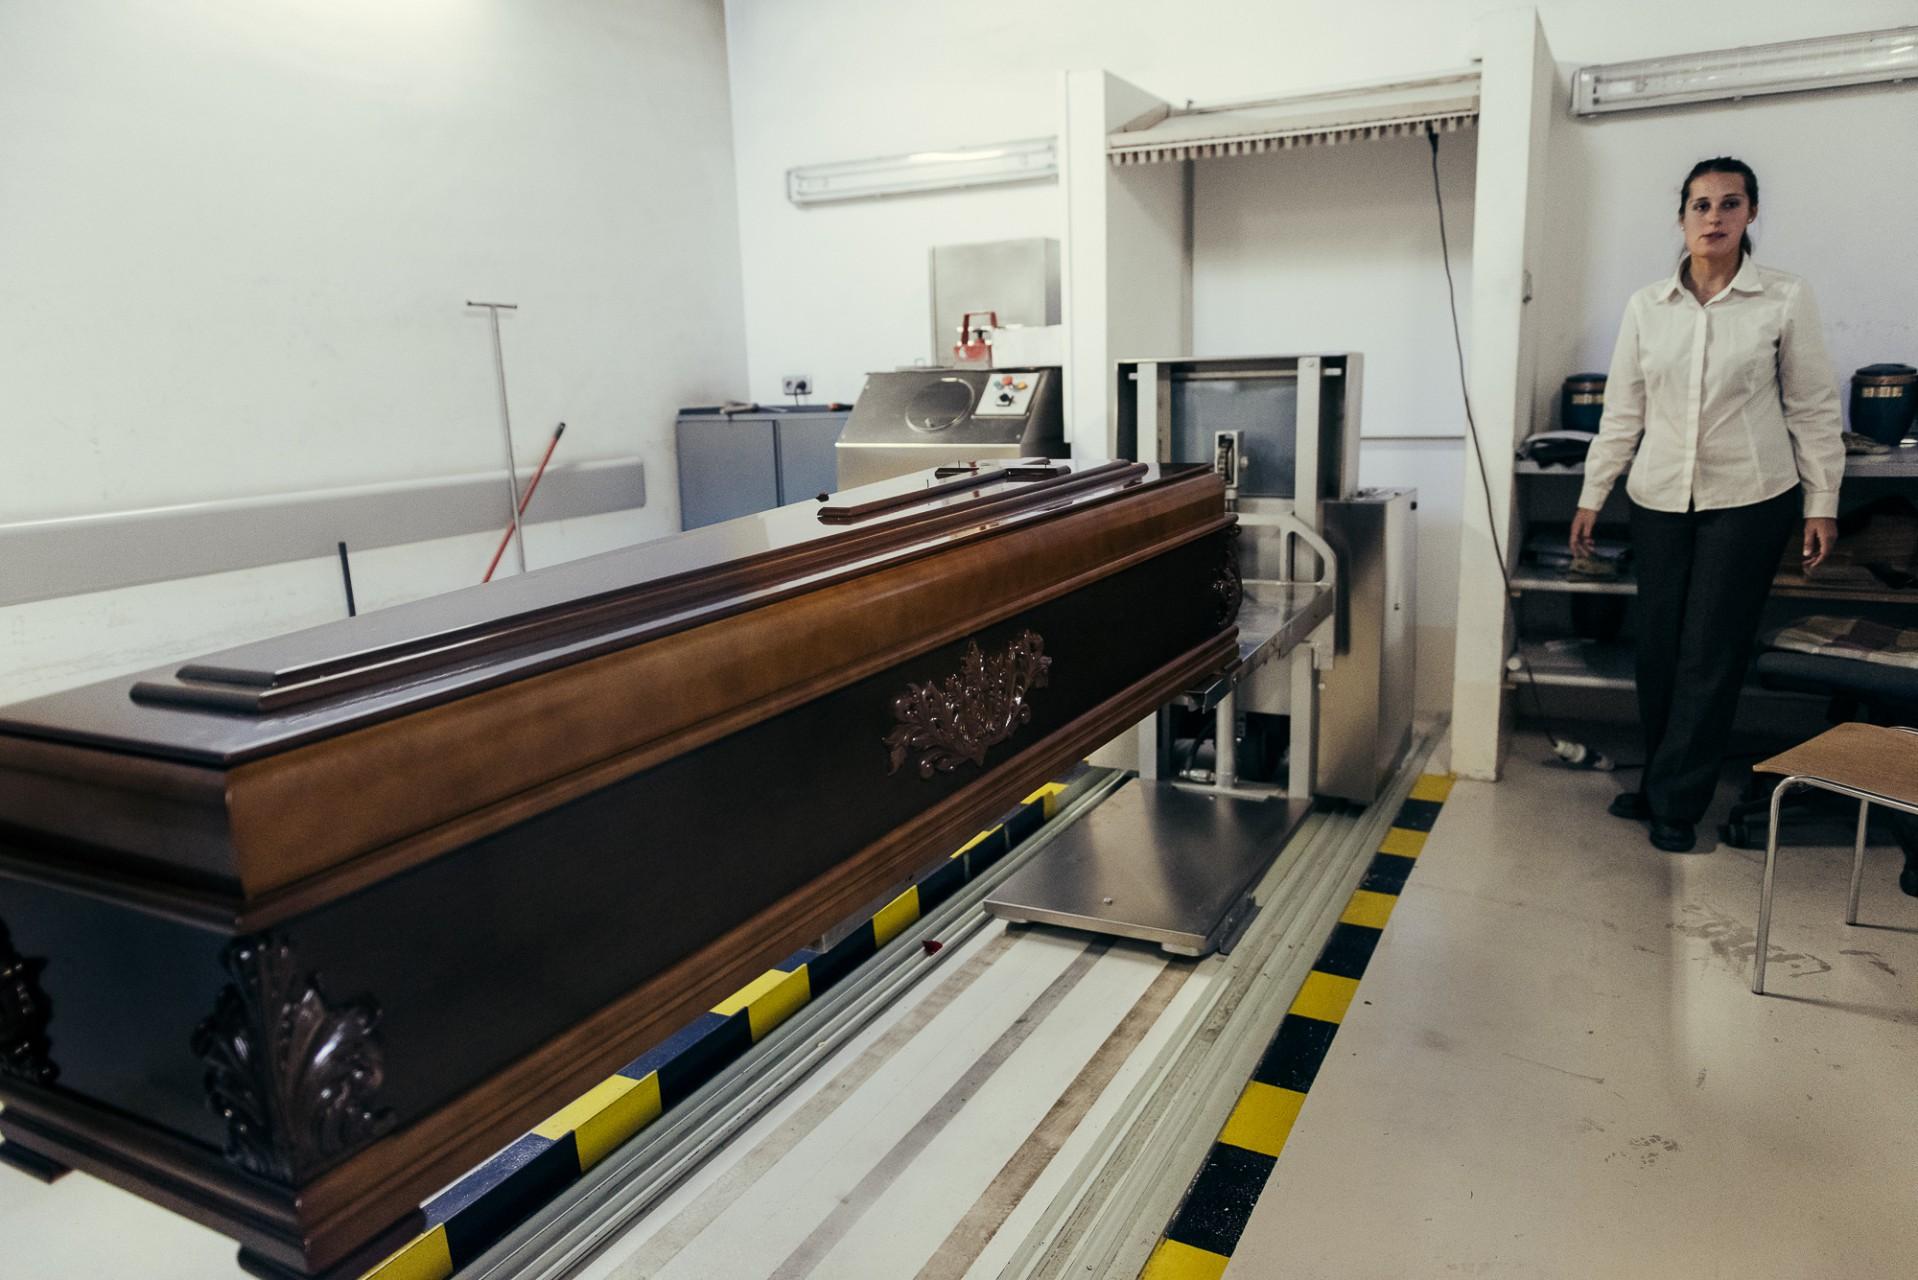 Ana Matos - sector funerario 2015-28